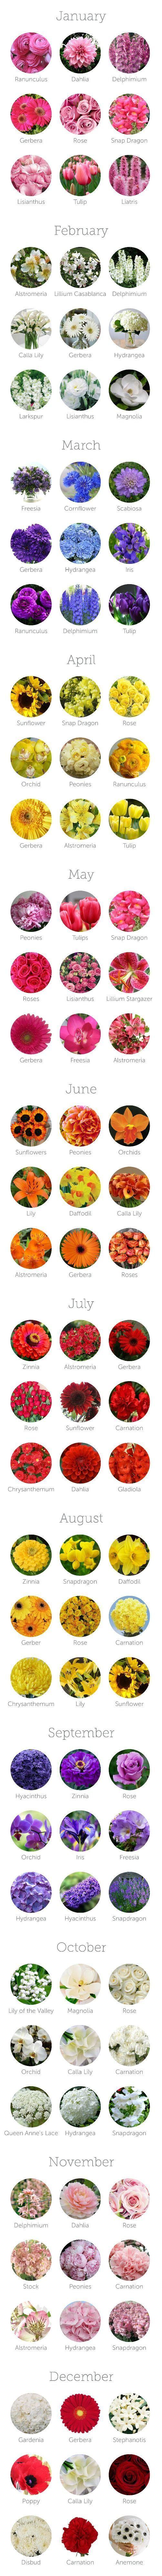 Wedding decorations with flowers november 2018 Wedding Flower Chart By Month wedding weddings wedding ideas wedding